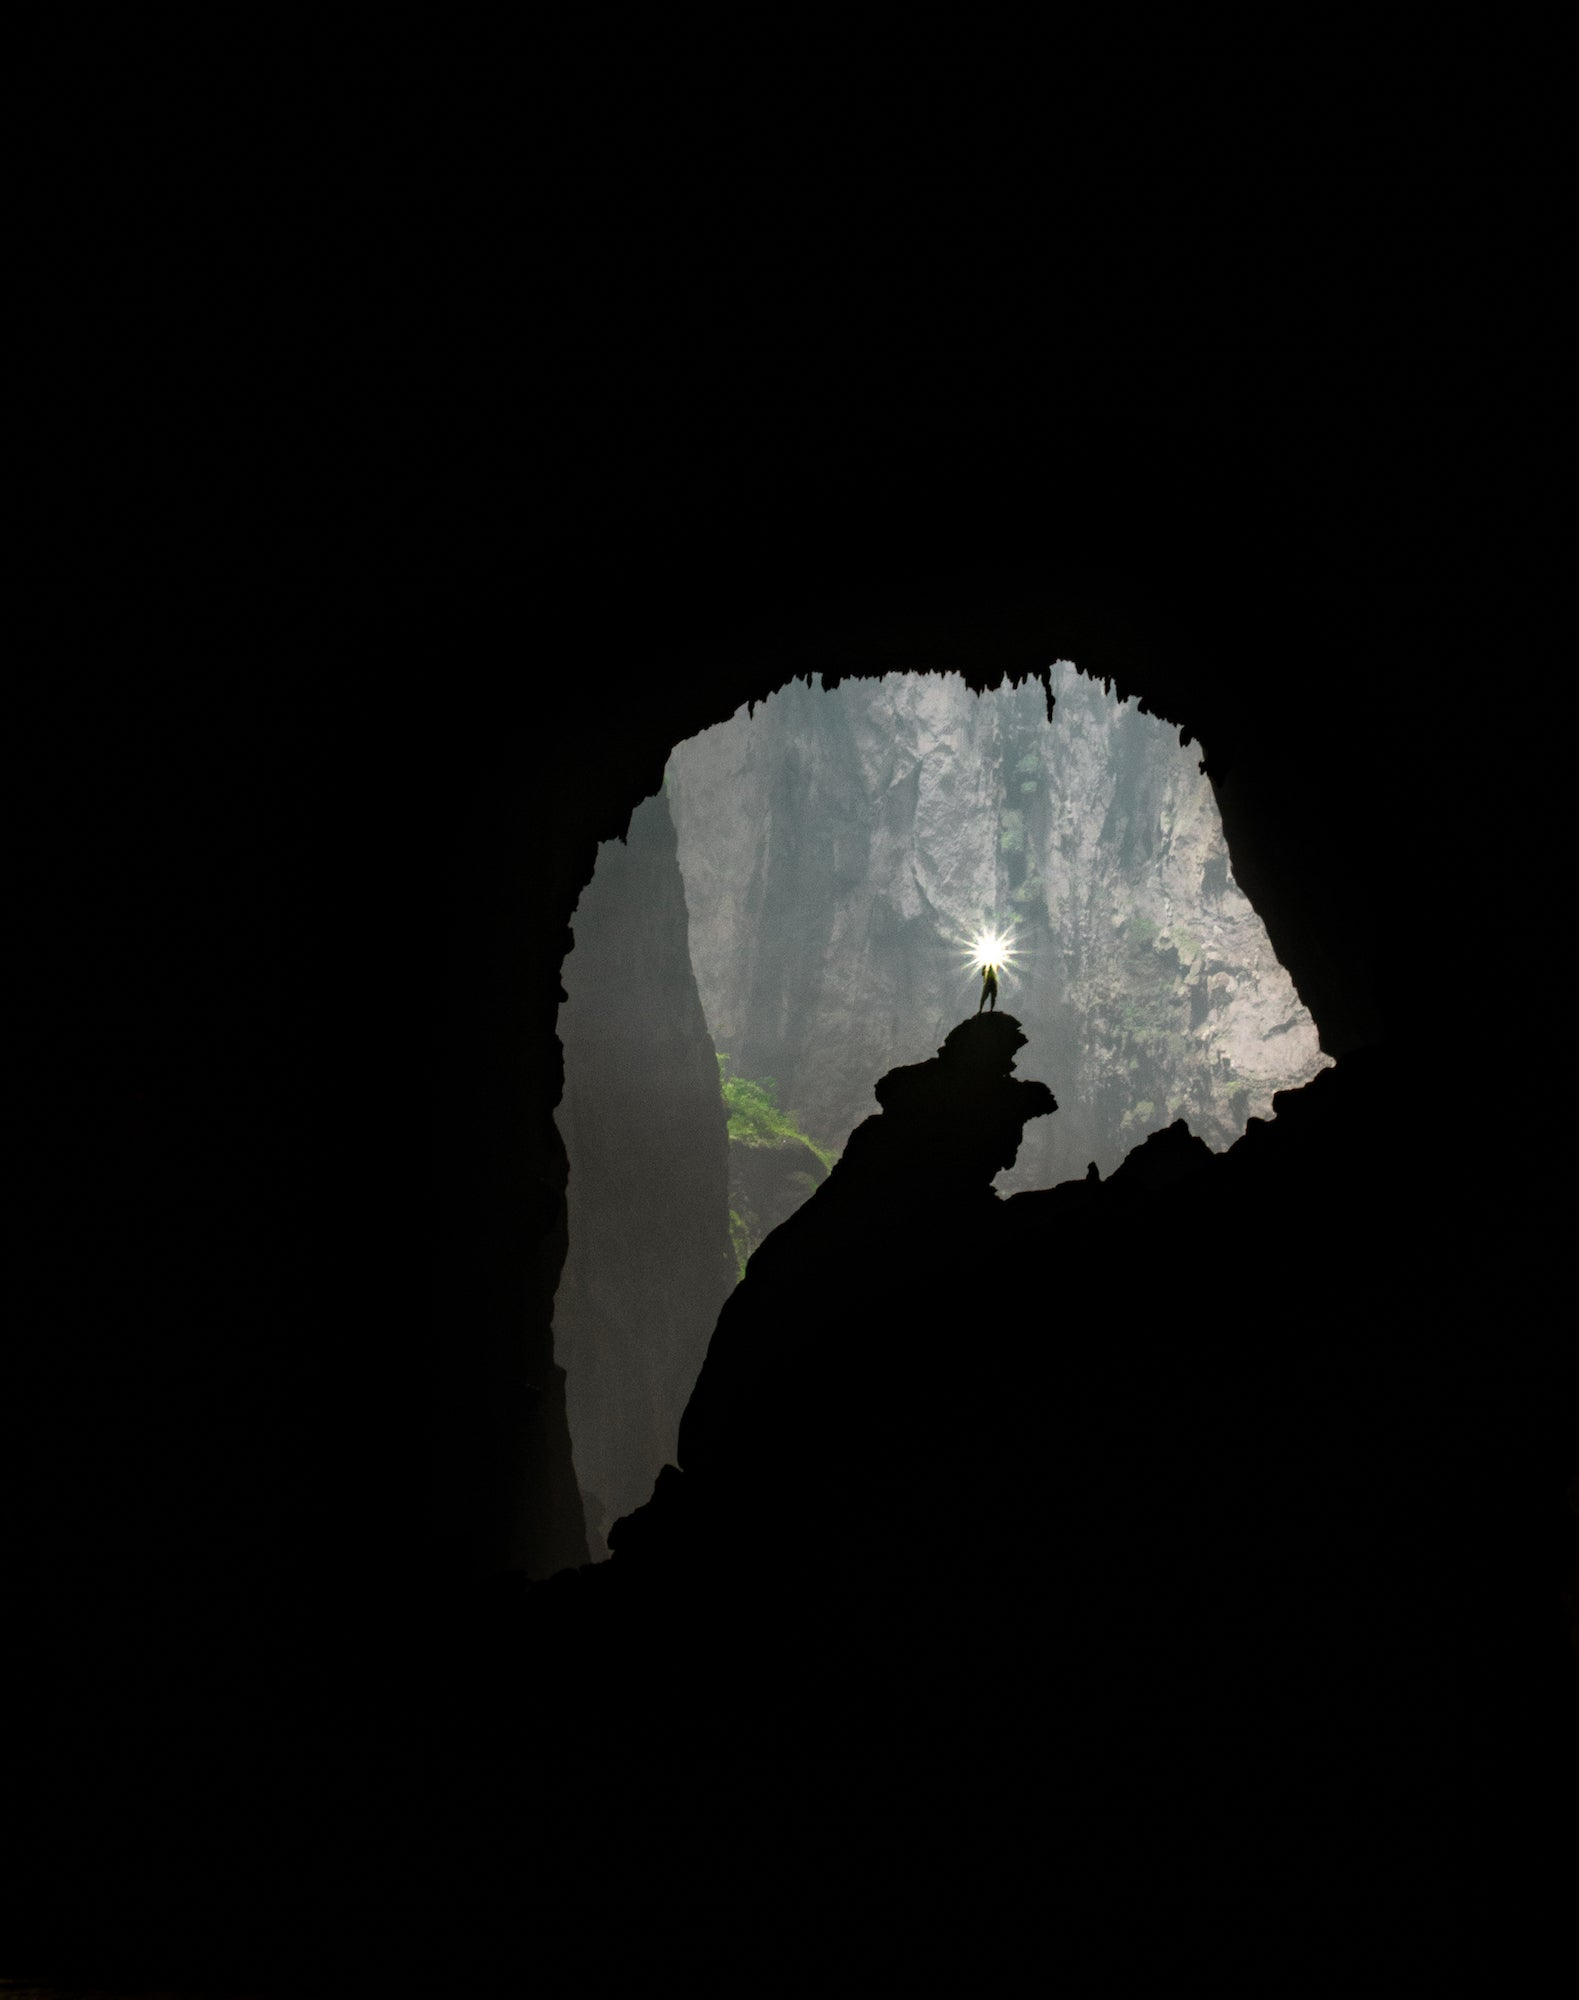 Alpha-Universe-Wyatt-Peterson-Cave-Photography-Sony-a7riii-2.jpeg